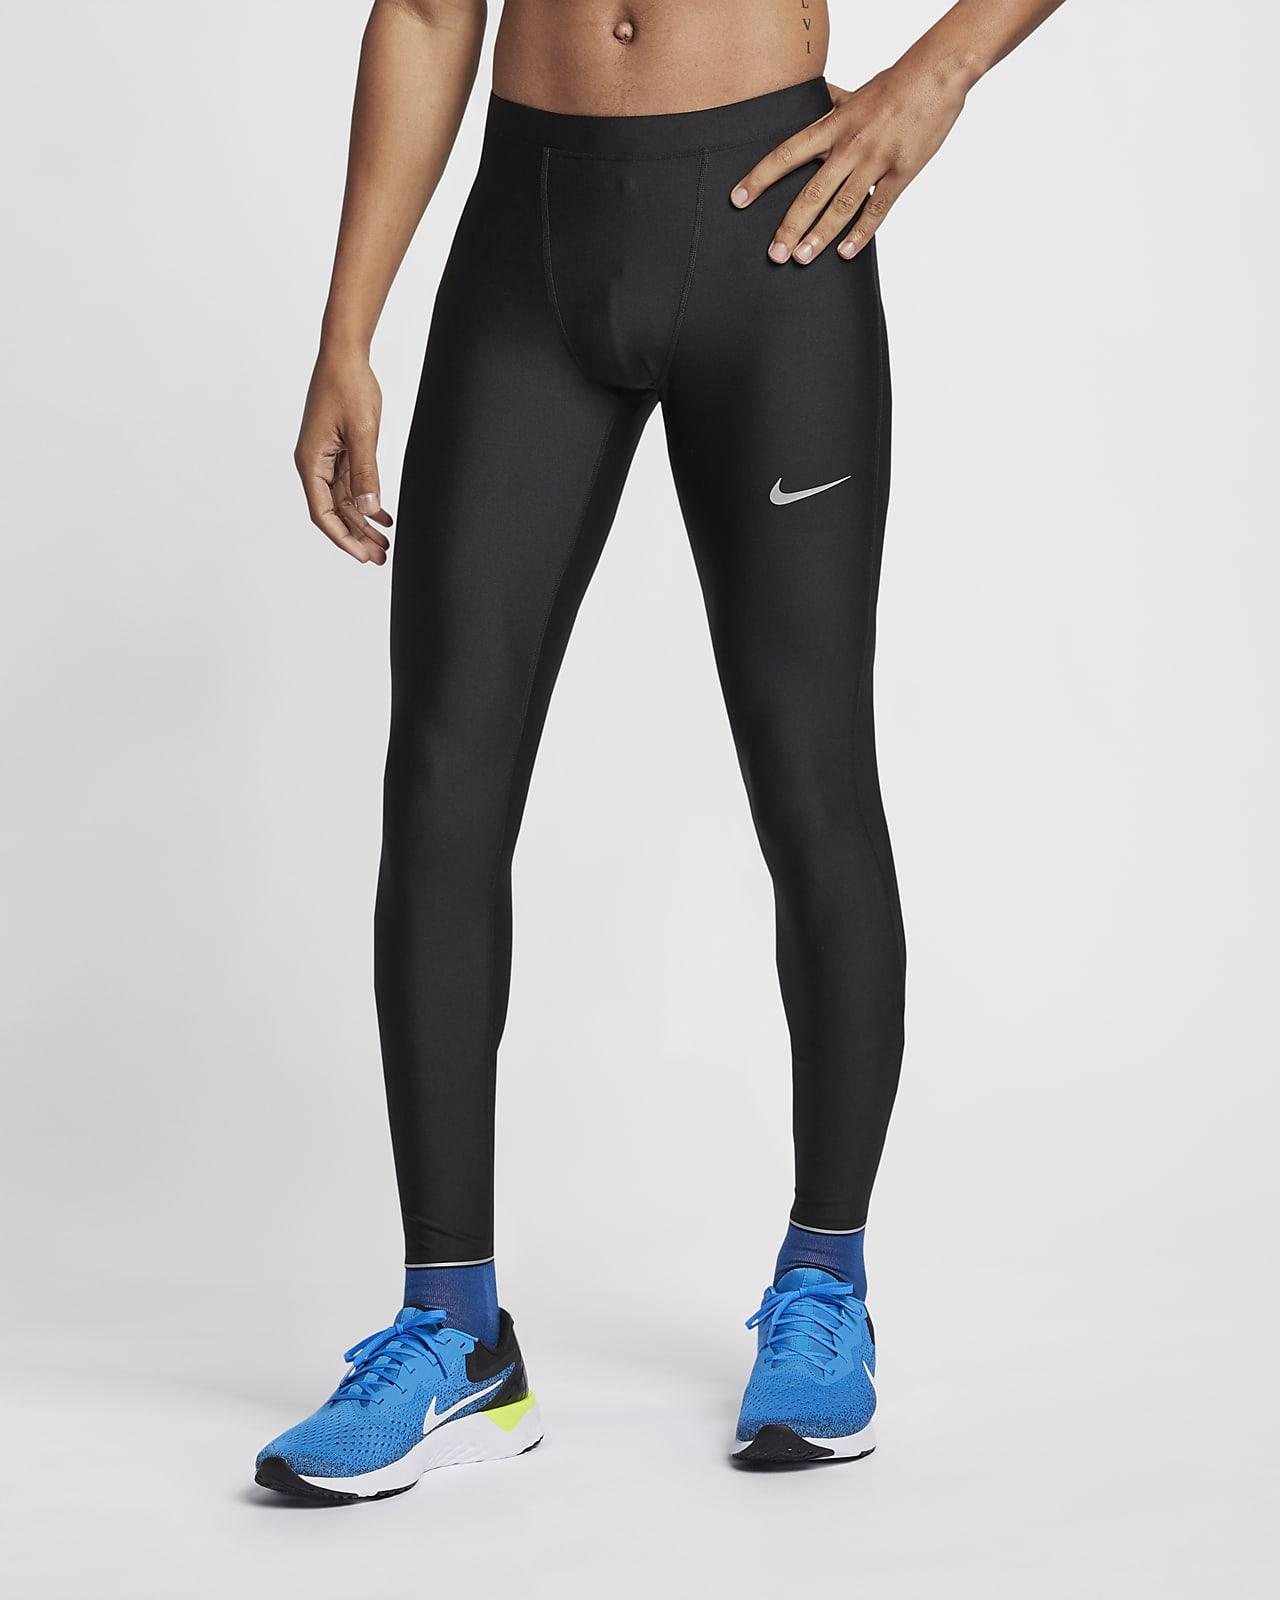 Men's Nike Running Tights (Black